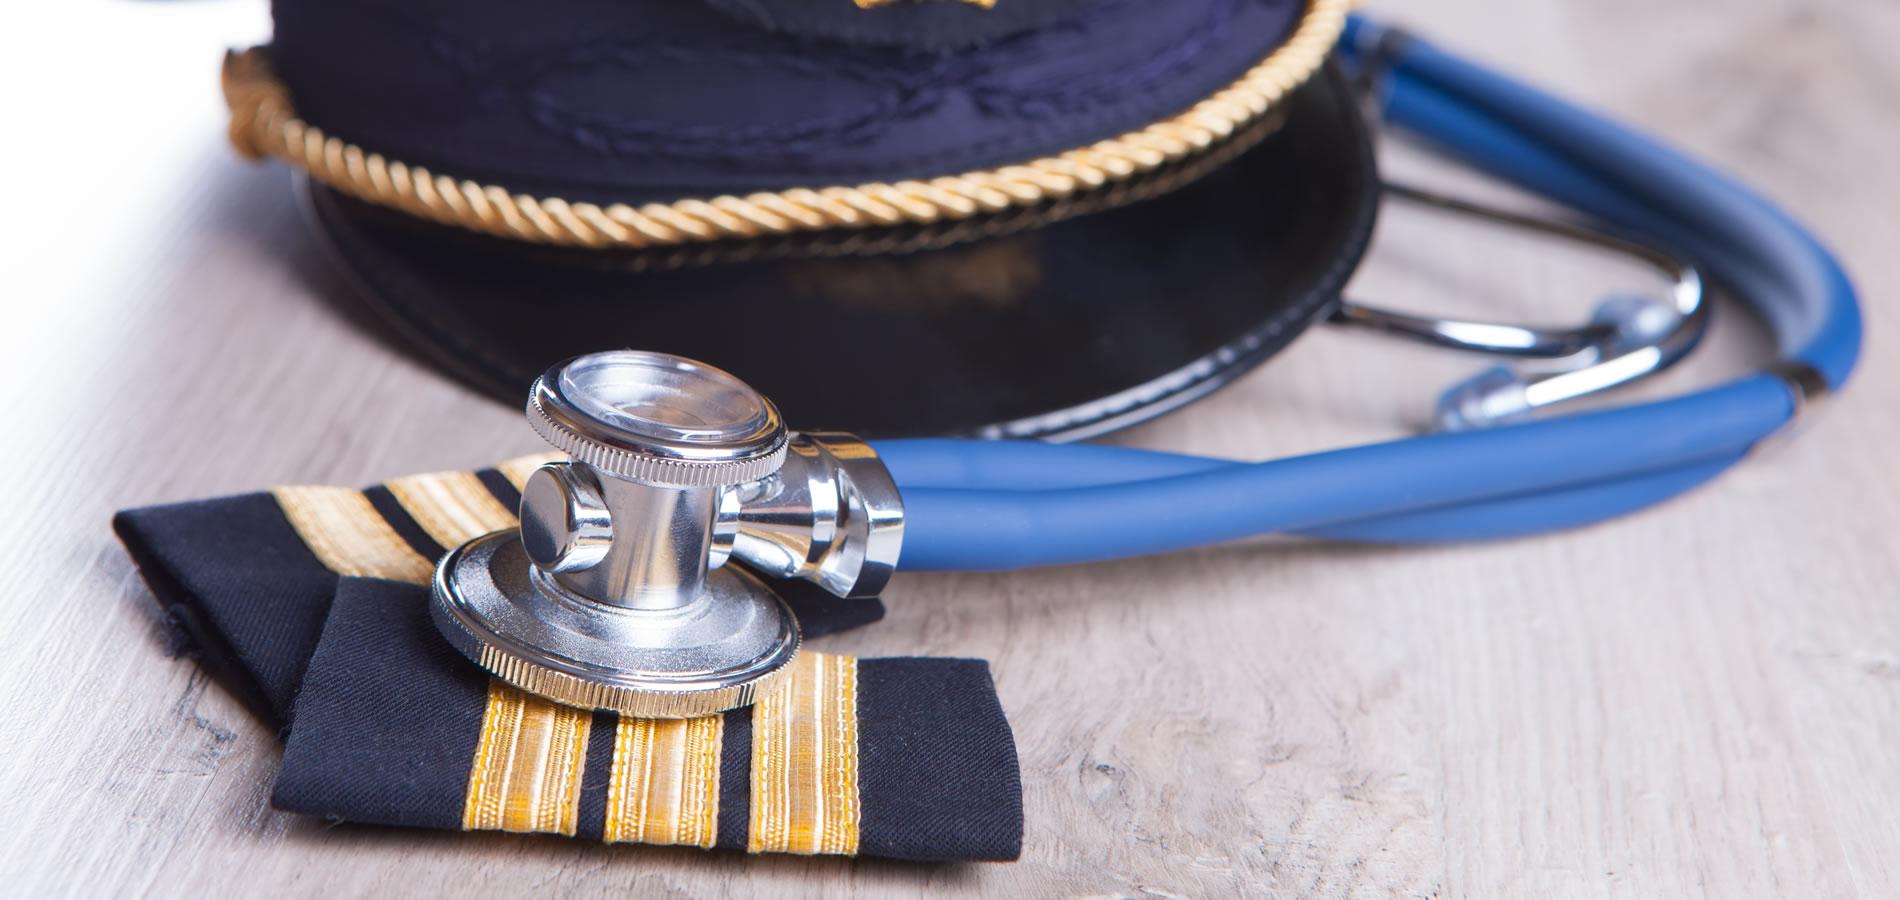 Nundah doctors